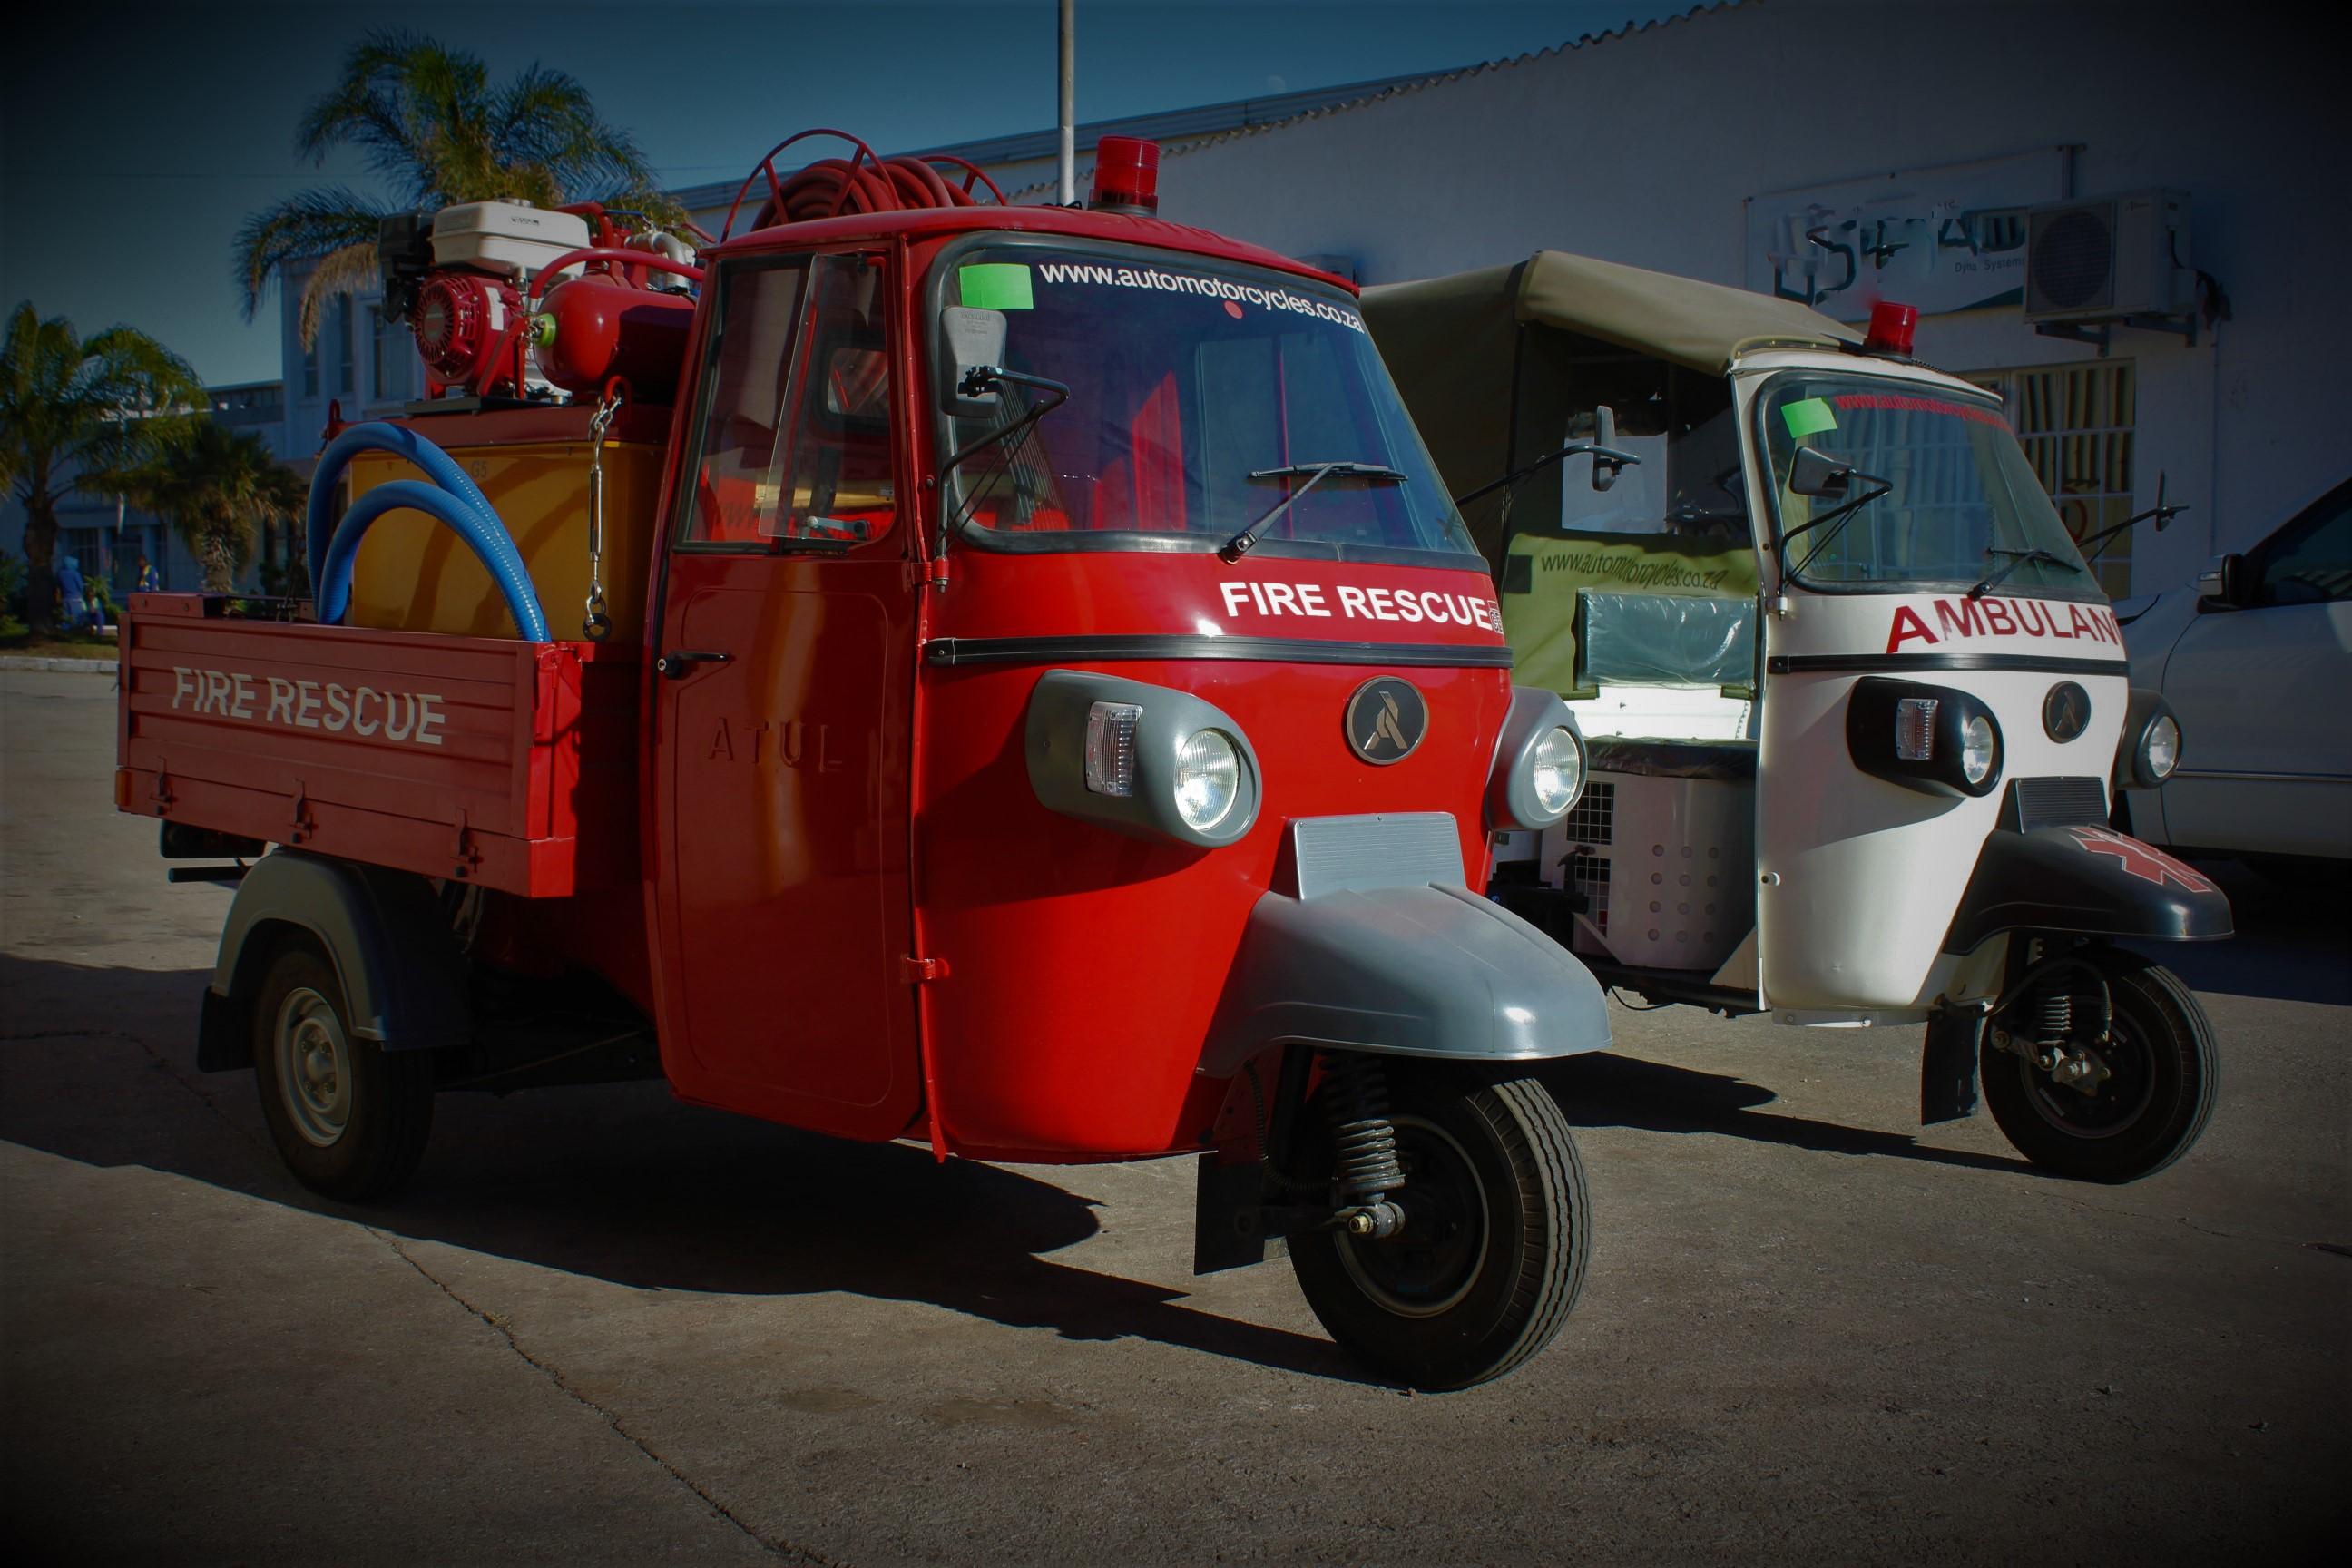 /srv/www/vhosts/user3101/html/entrepreneurship-campus.org/wp-content/uploads/2019/06/Fire_Engine_and_ambulance-1.jpg